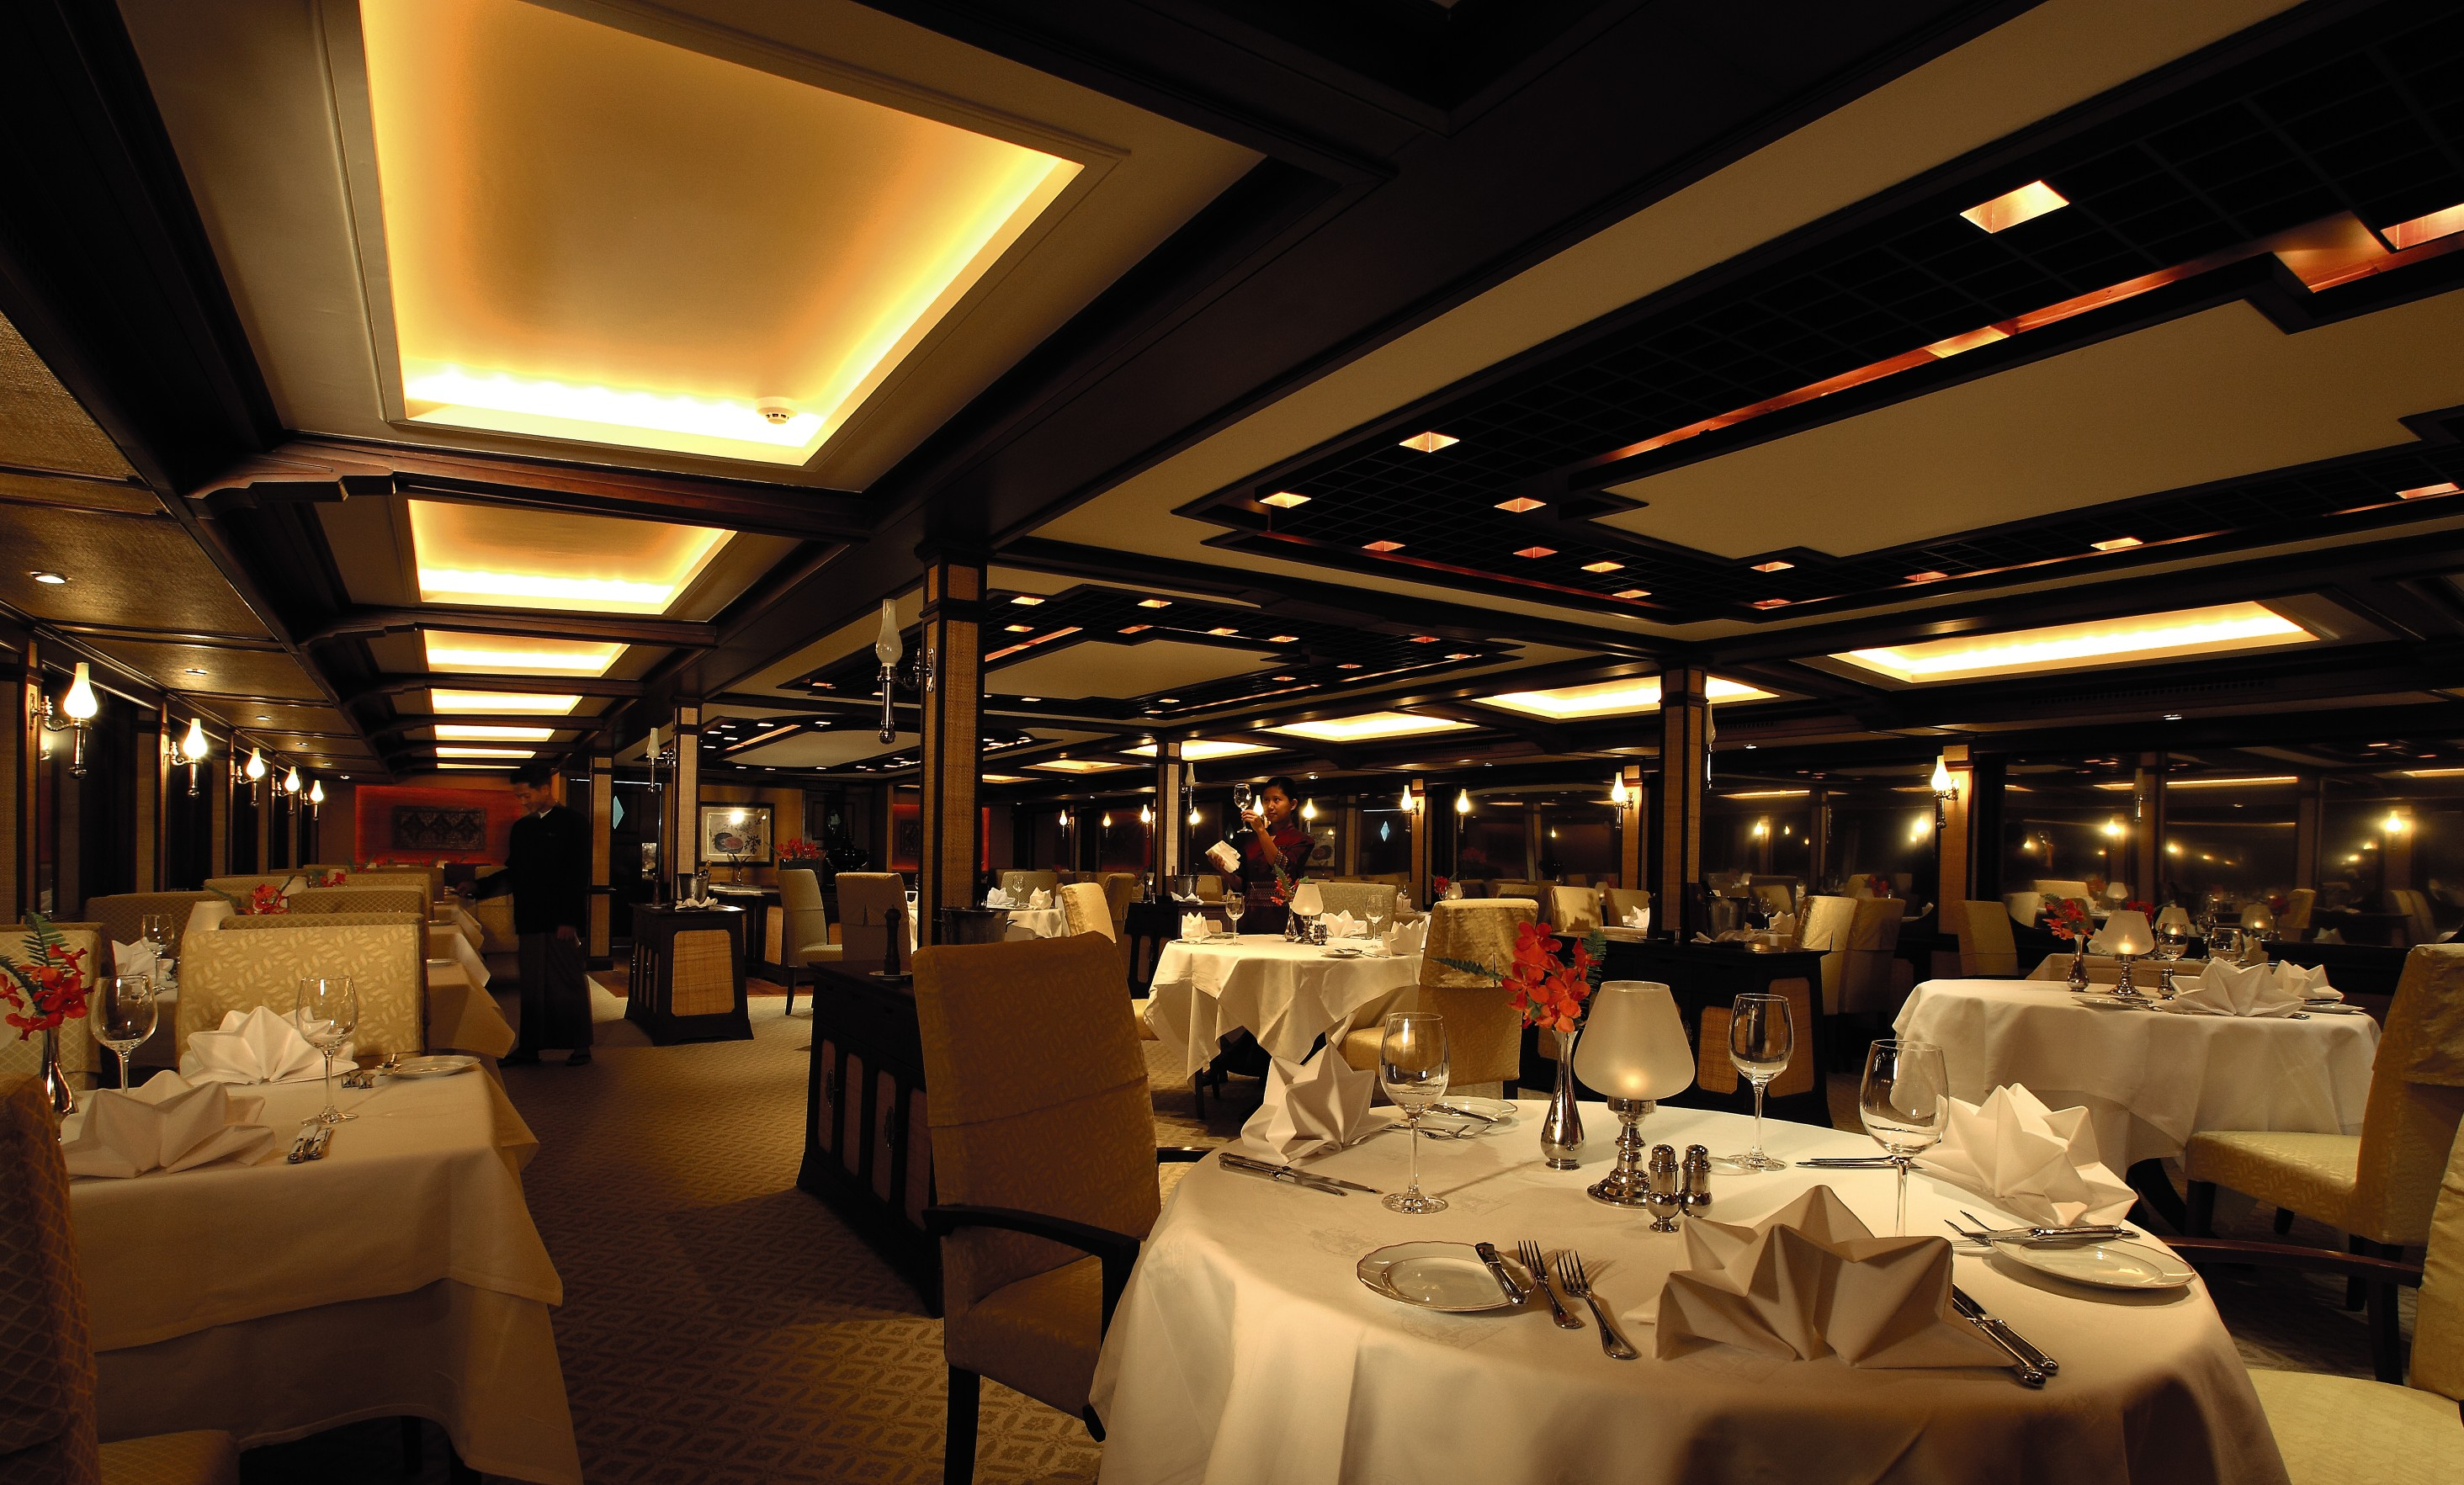 Belmond River Cruises Road to Mandalay Interior Restaurant Diner 03.jpg